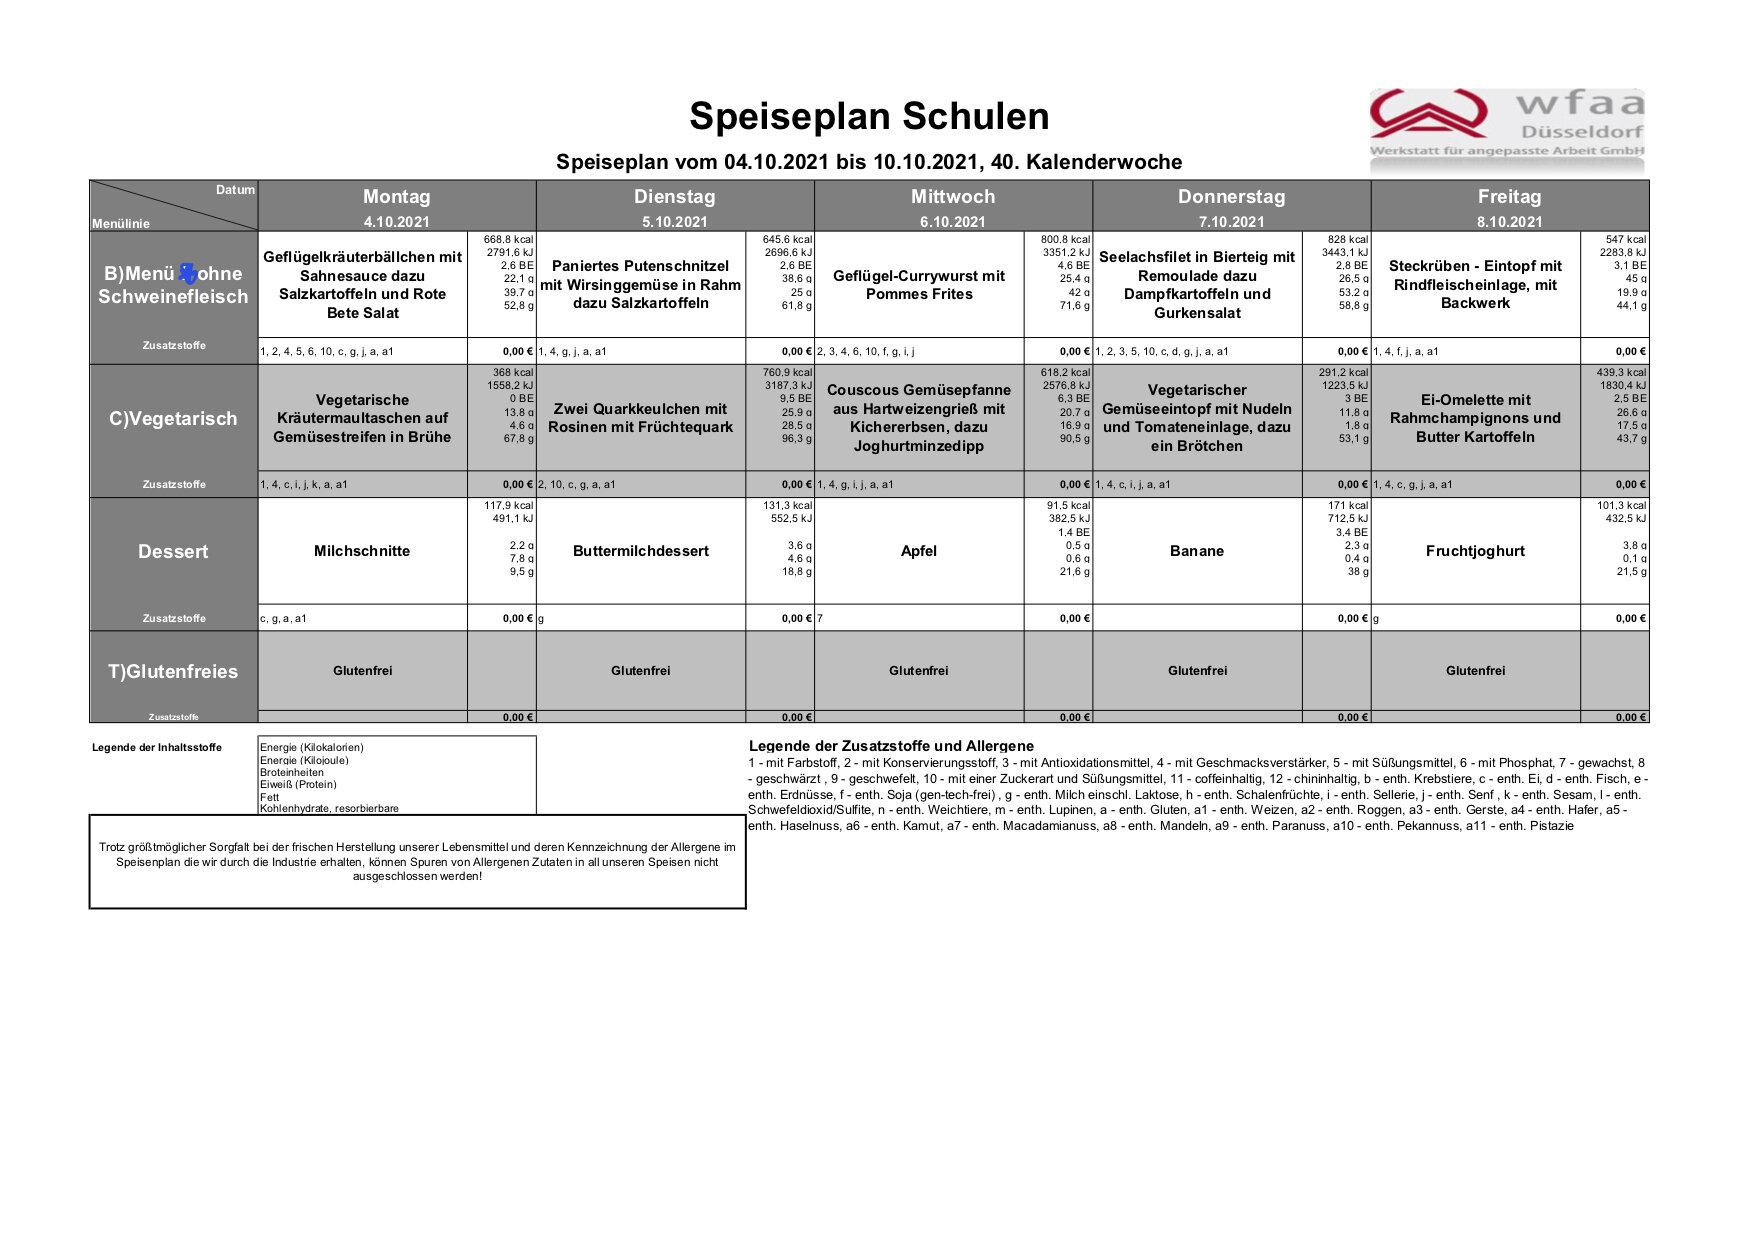 Speiseplan 04.10. - 10.10.2021 (KW 40)